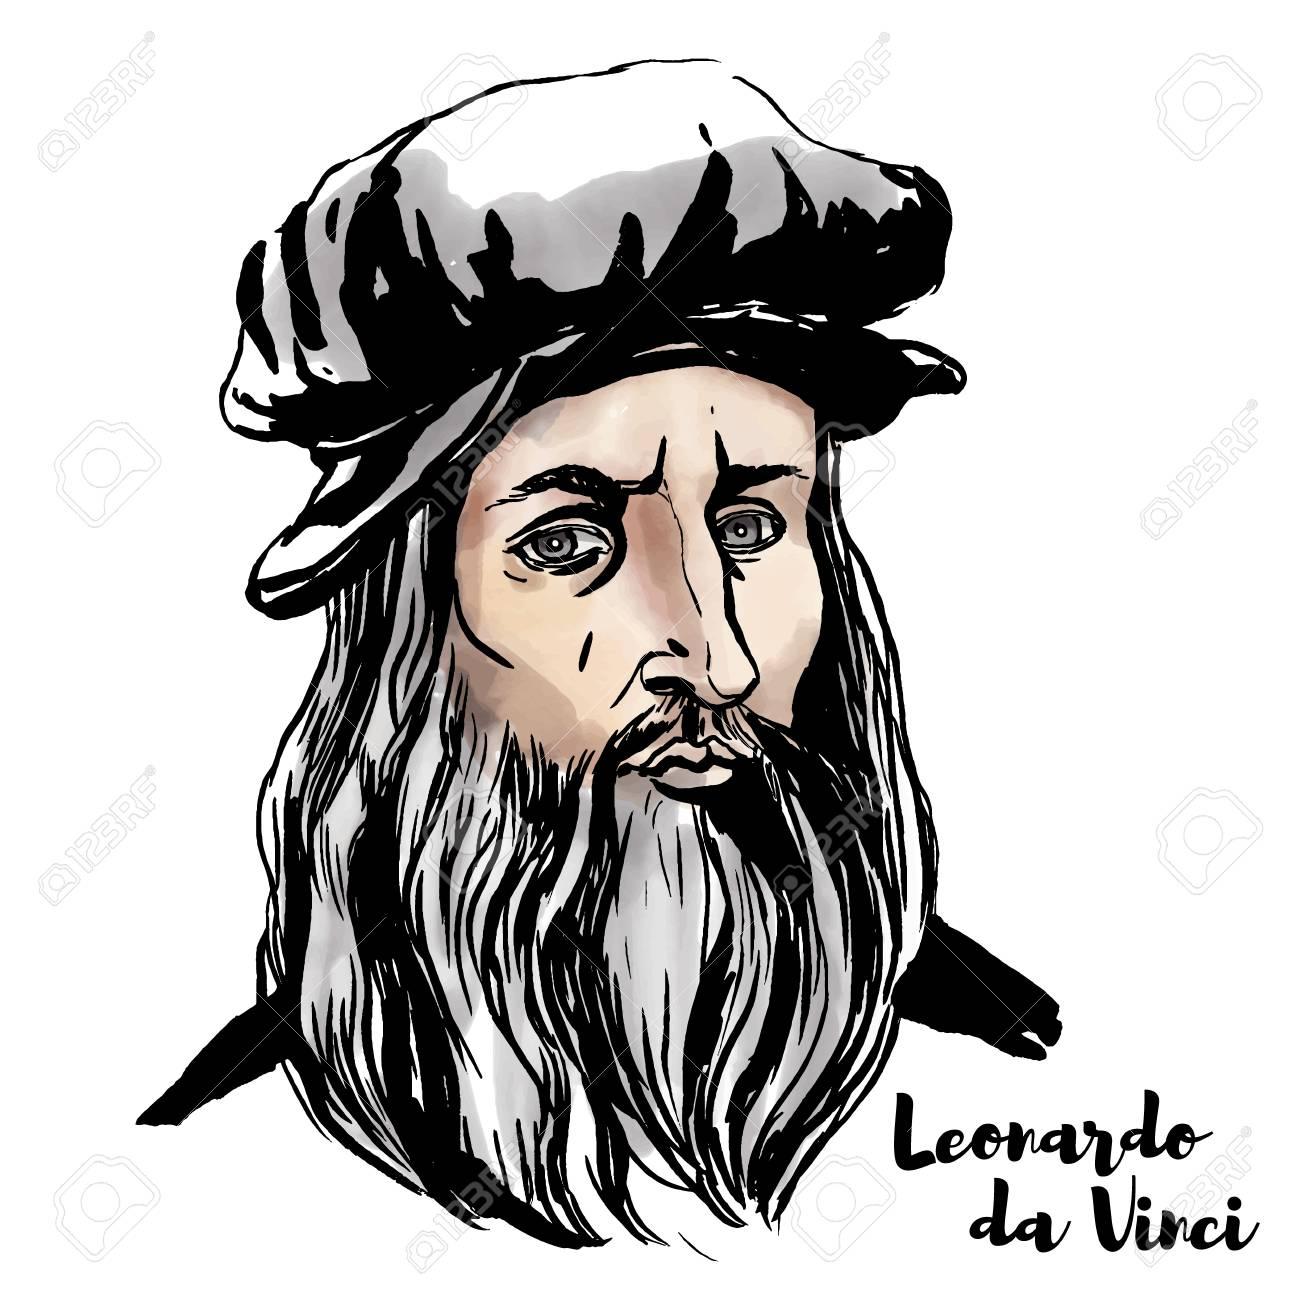 Leonardo da Vinci watercolor vector portrait with ink contours..